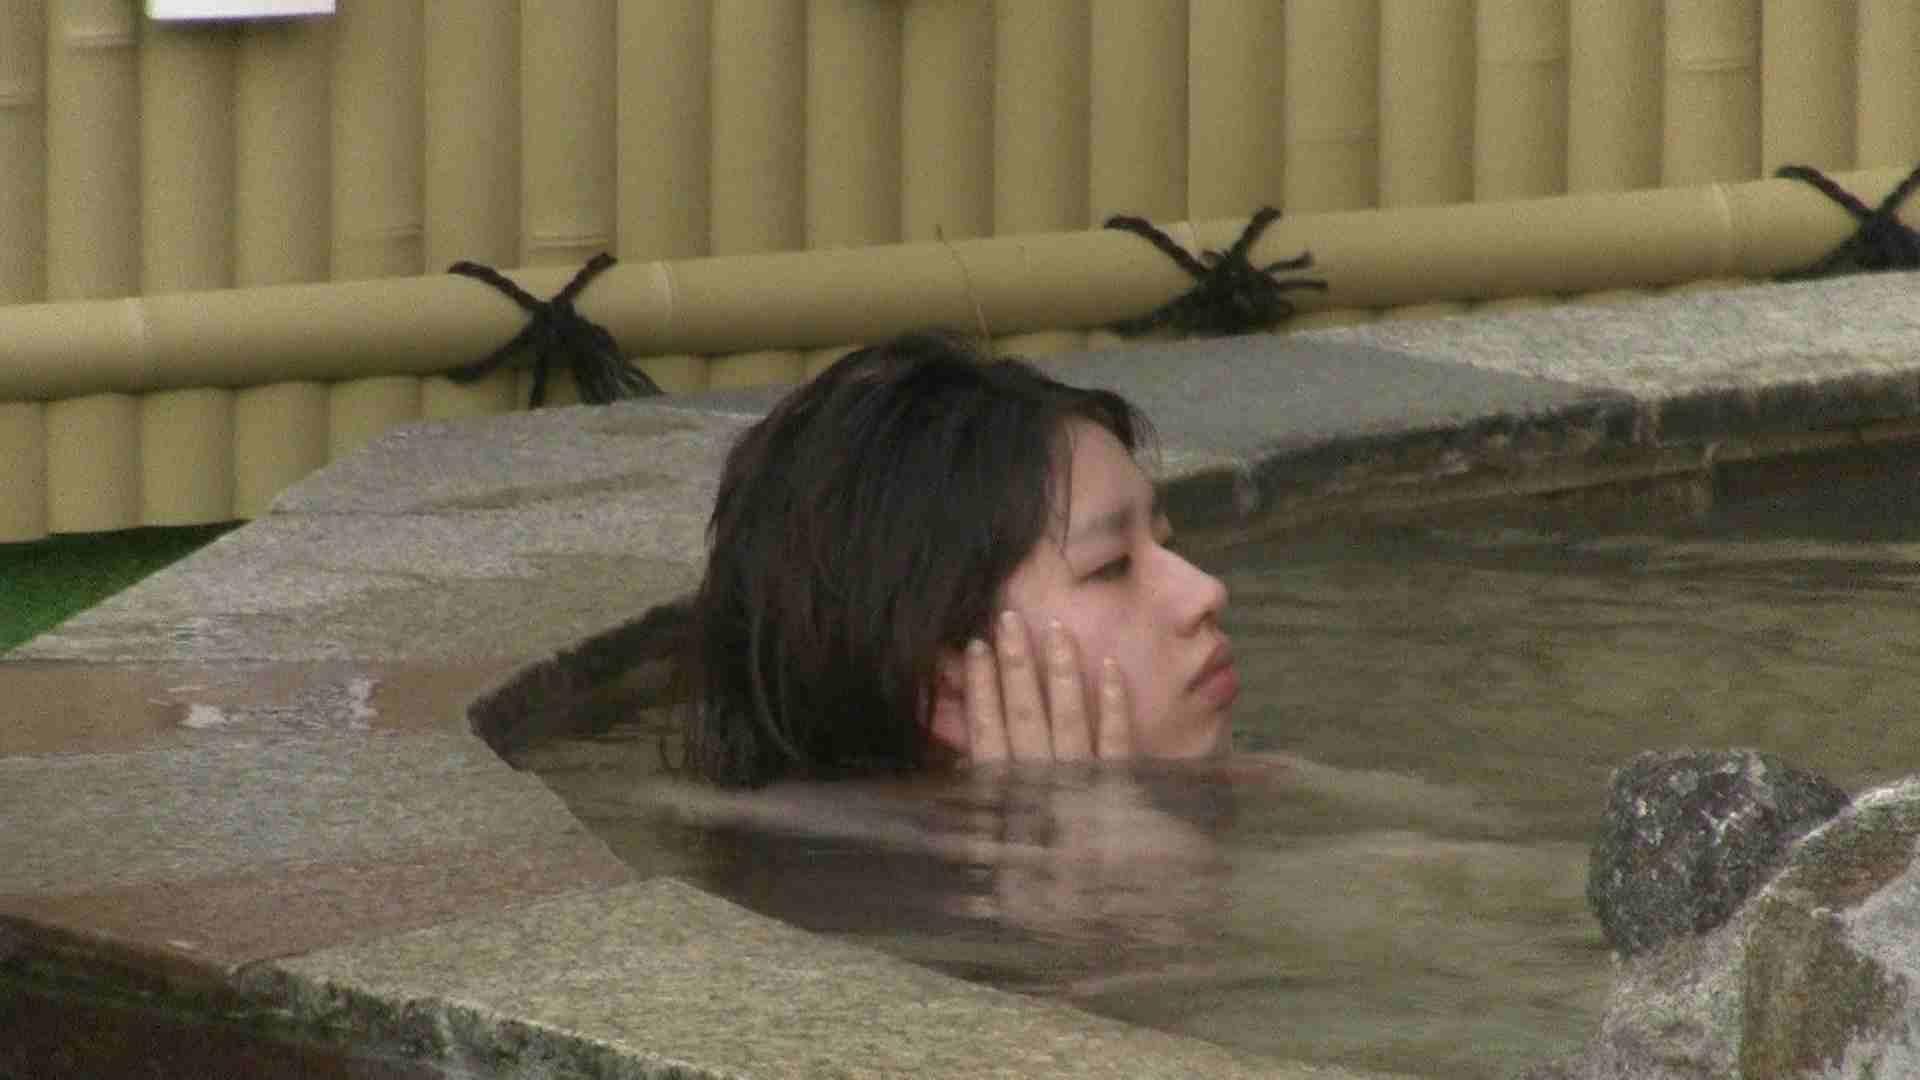 Aquaな露天風呂Vol.230 HなOL | 盗撮  83pic 80